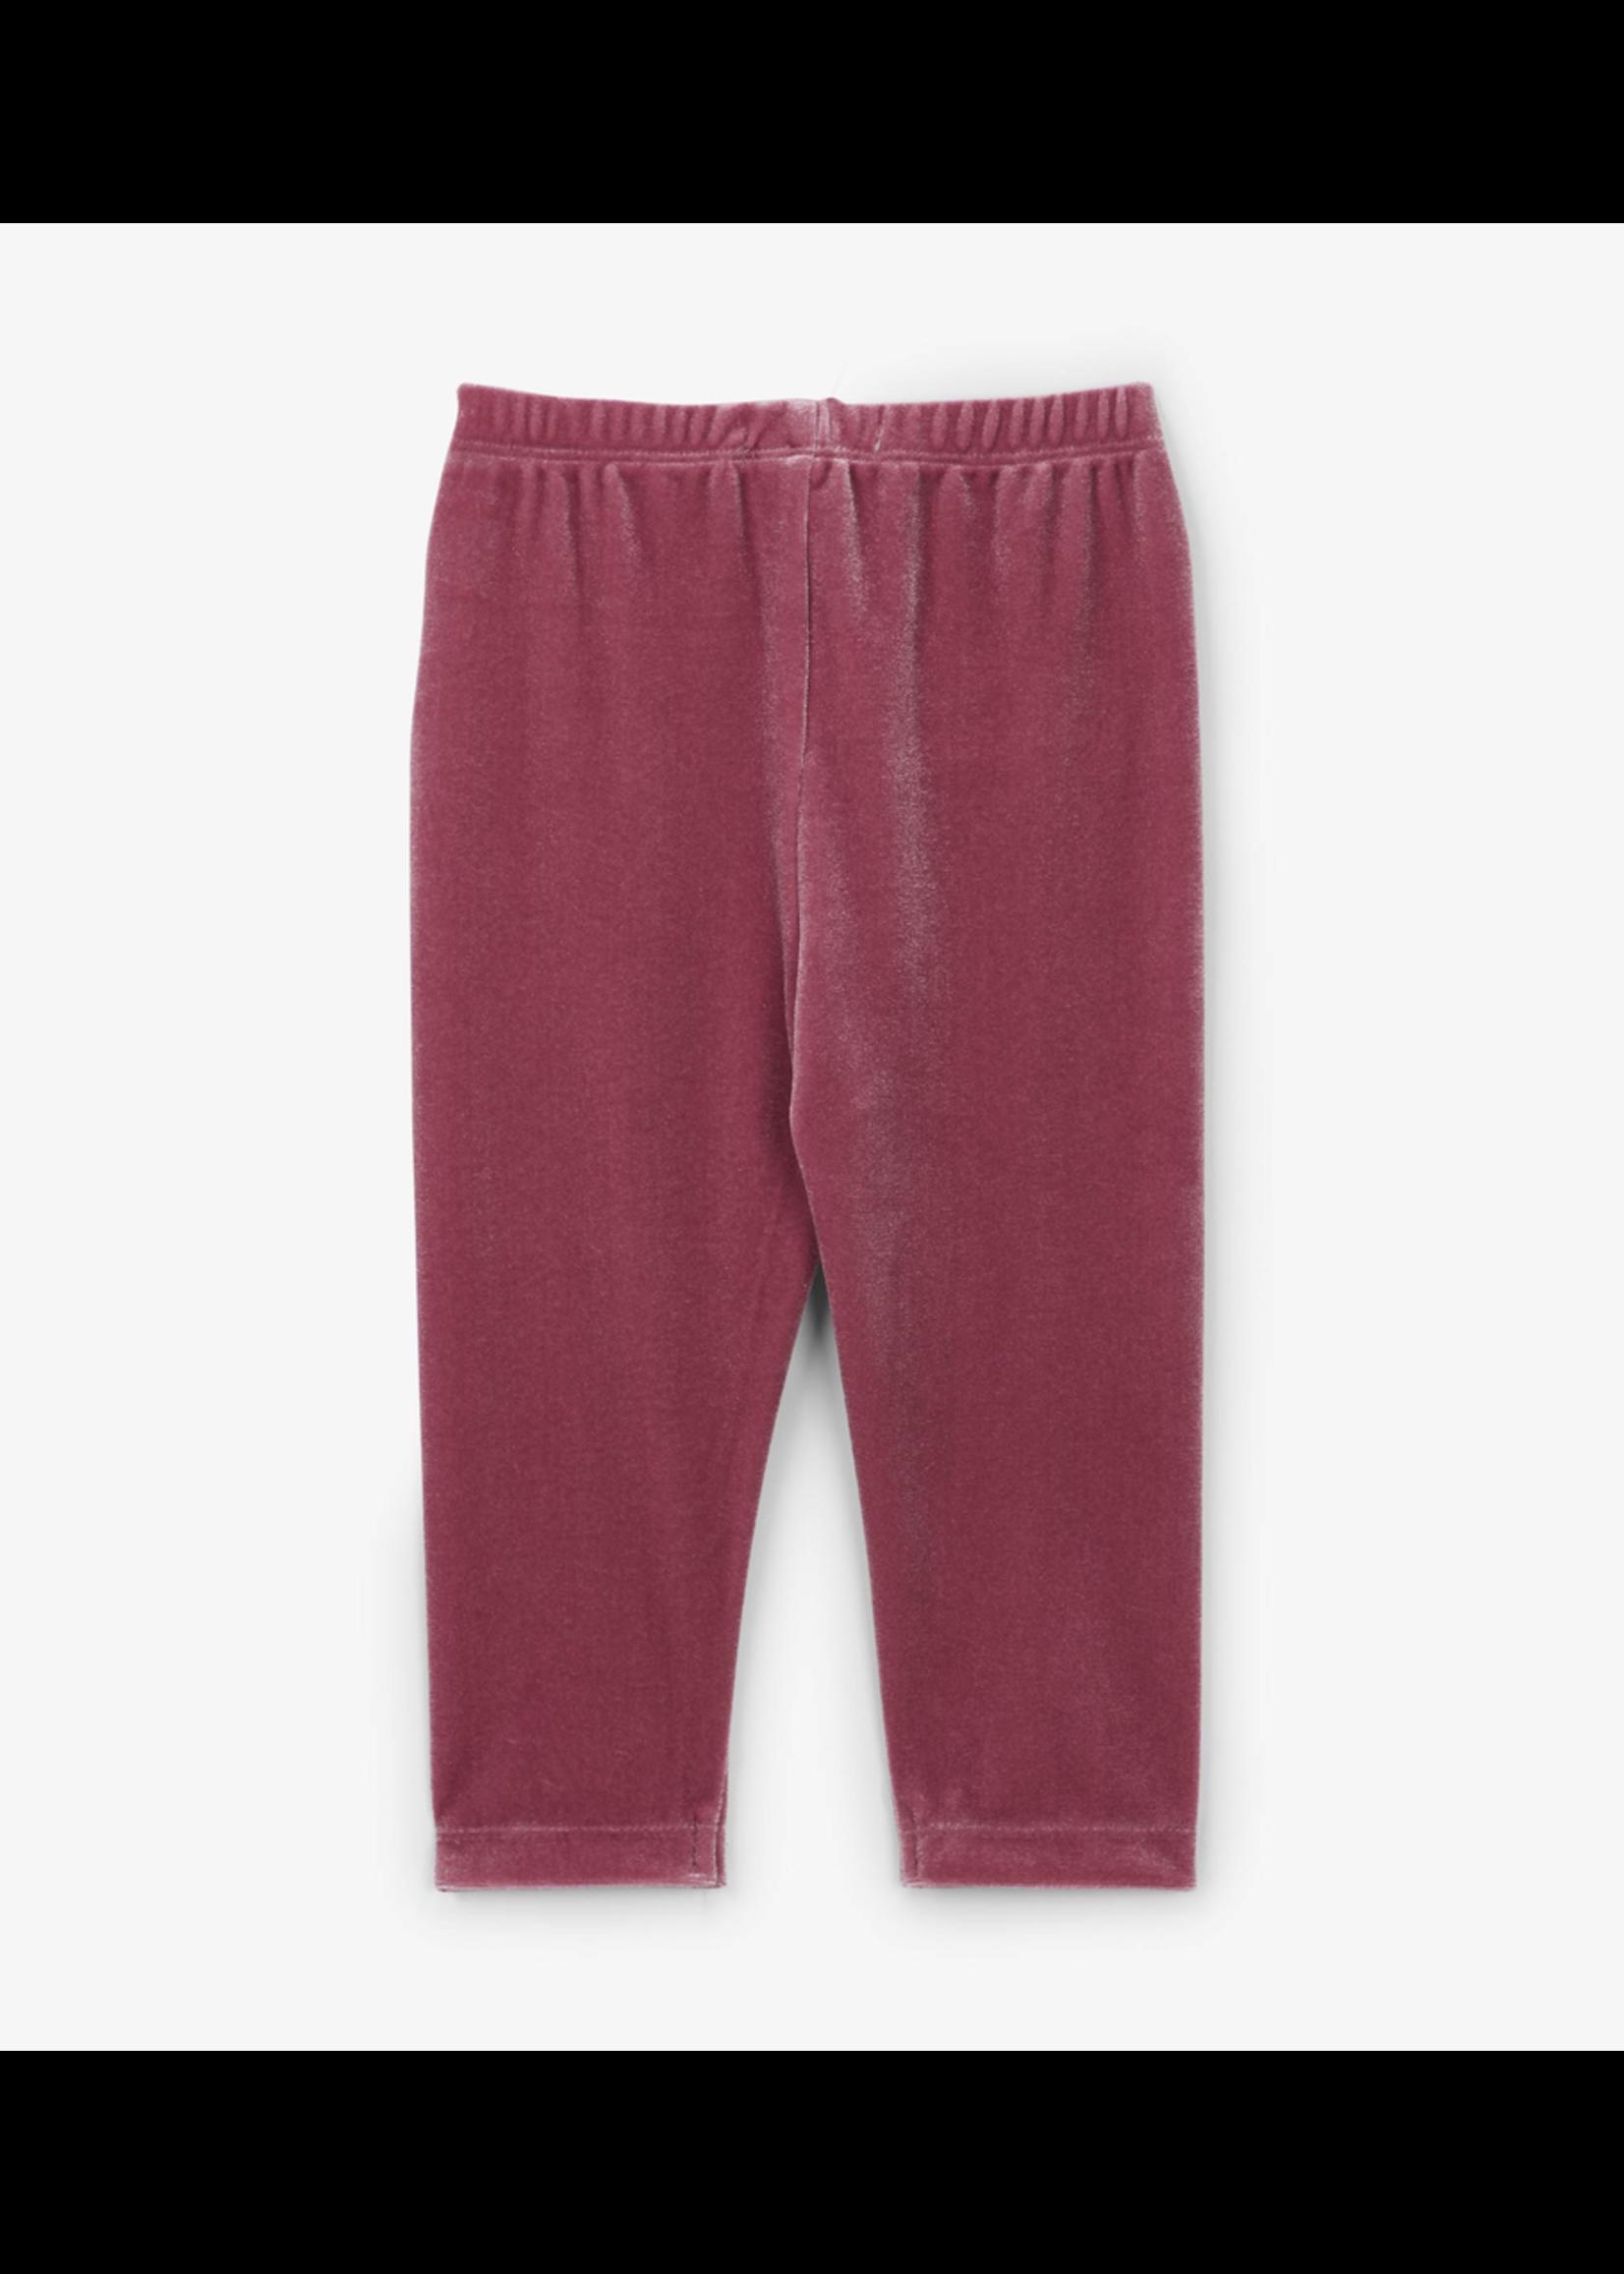 Hatley Hatley, Pink Velour Leggings for Baby Girl